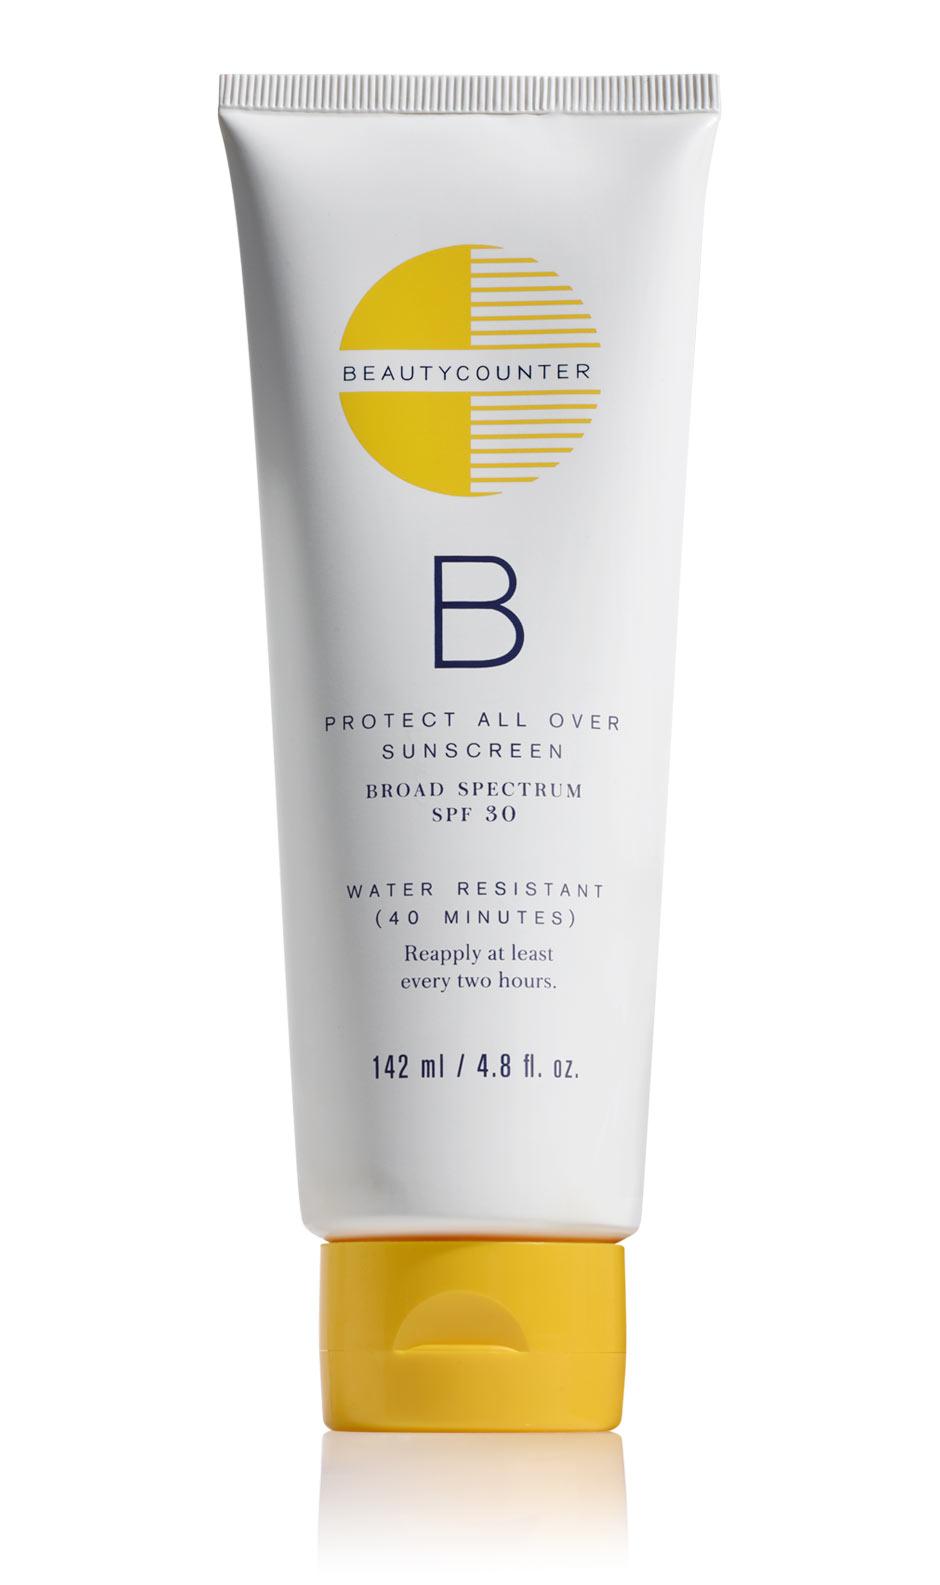 BeautyCounter Protect All Over Sunscreen